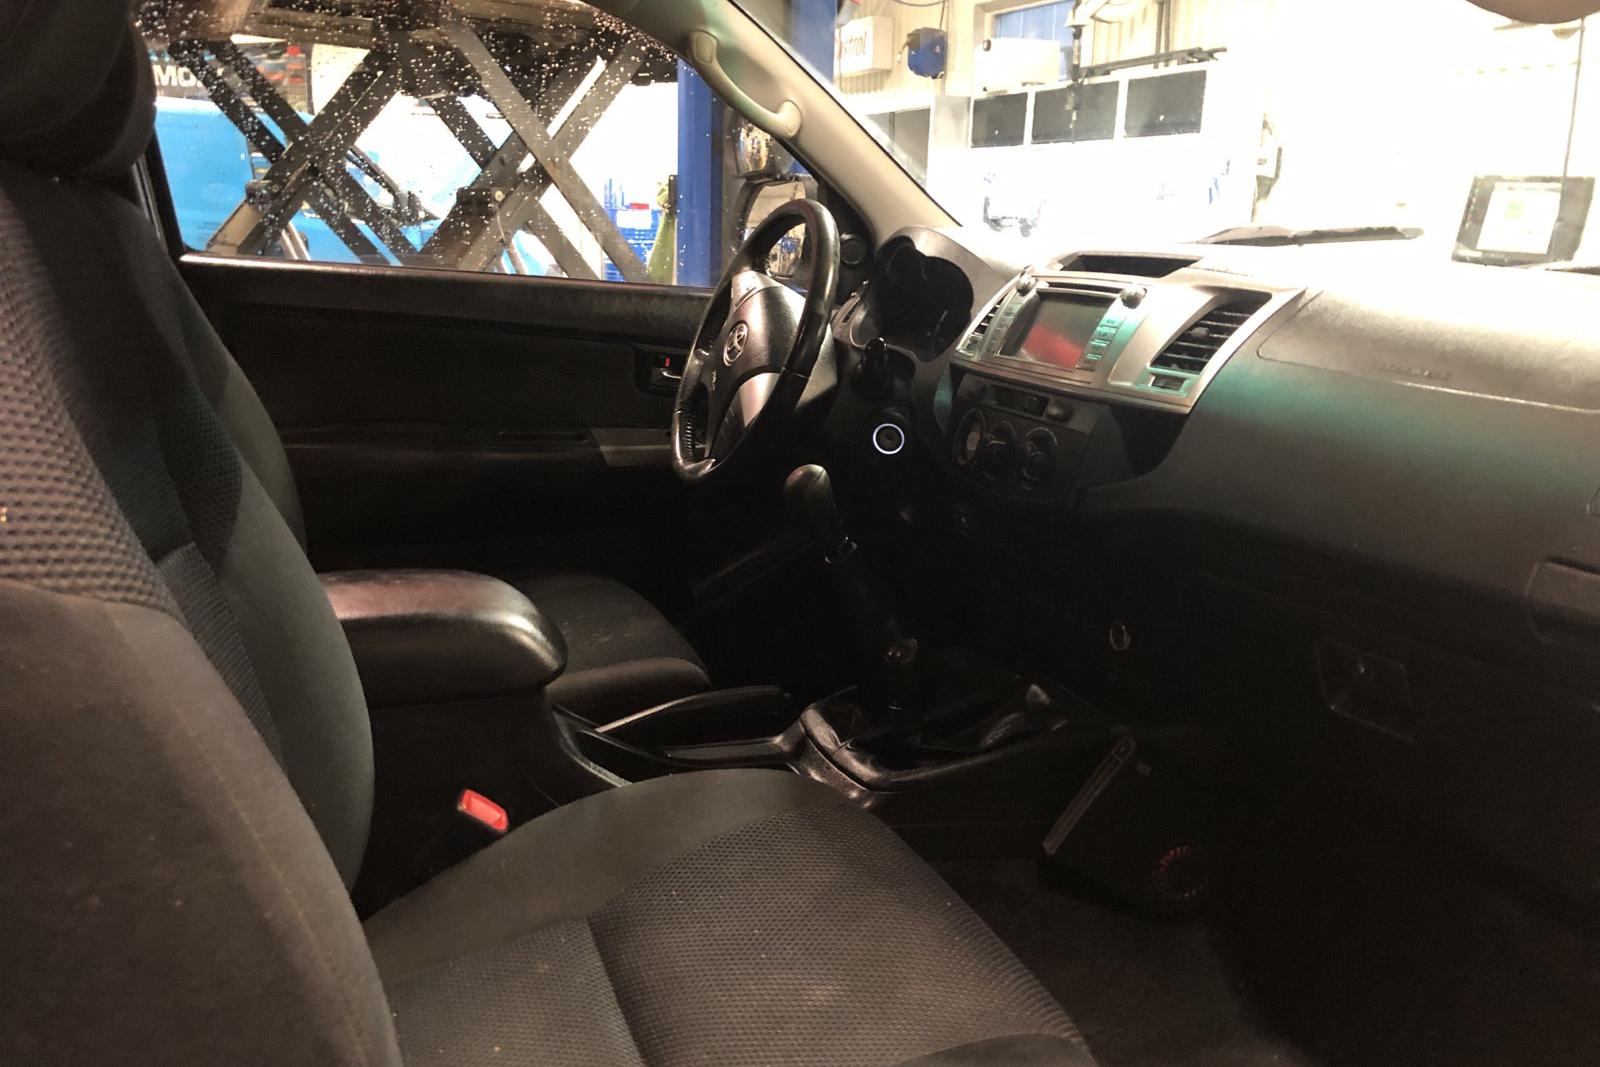 Toyota Hilux 2.5 D-4D 4WD (144hk) - 177 520 km - Manual - white - 2014